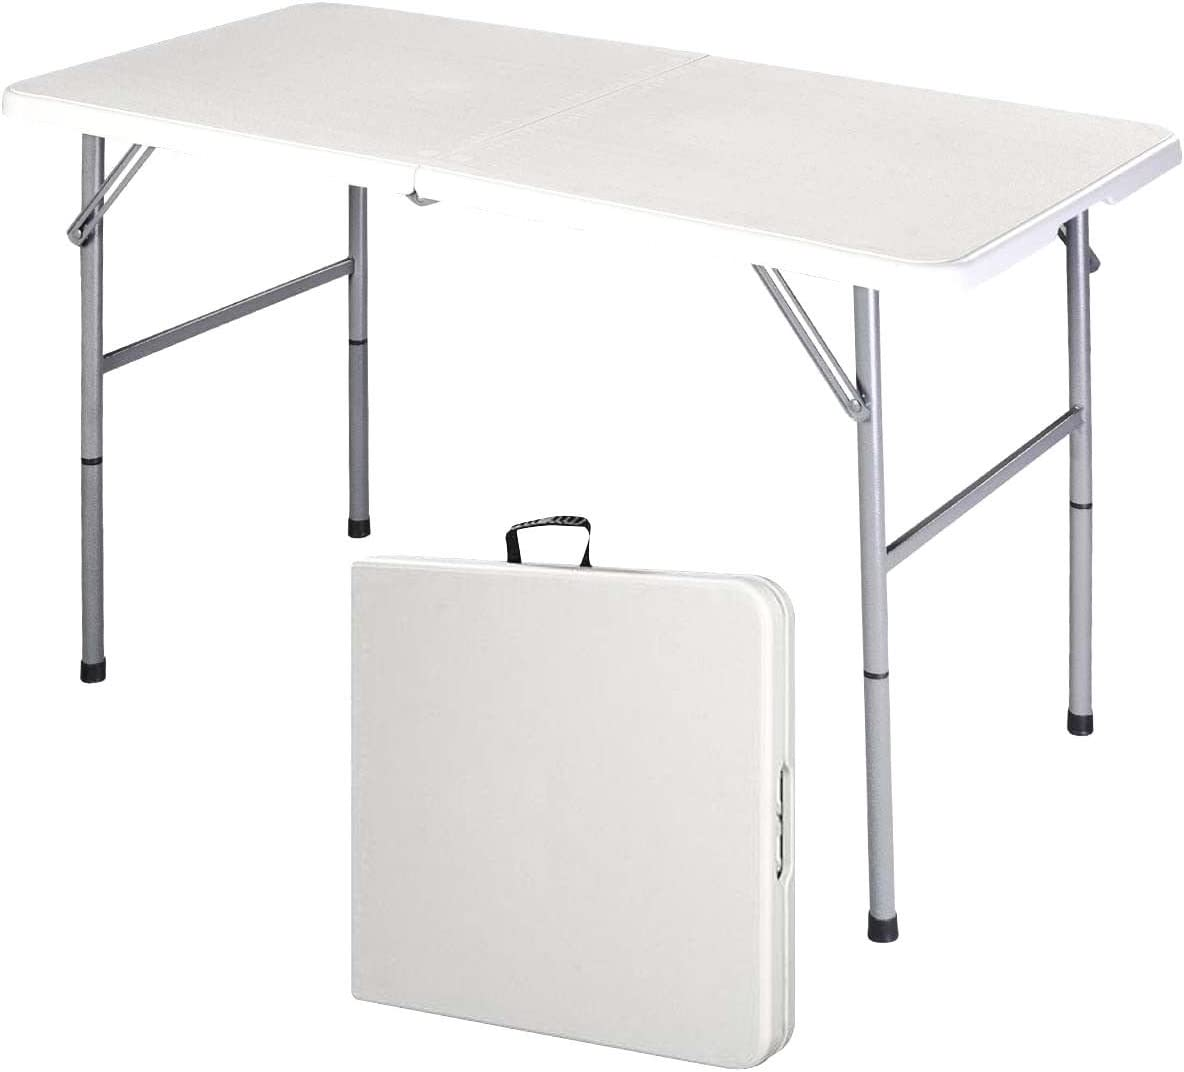 - Amazon.com: Supremus 4 Ft. Folding Table, Portable, High Utility